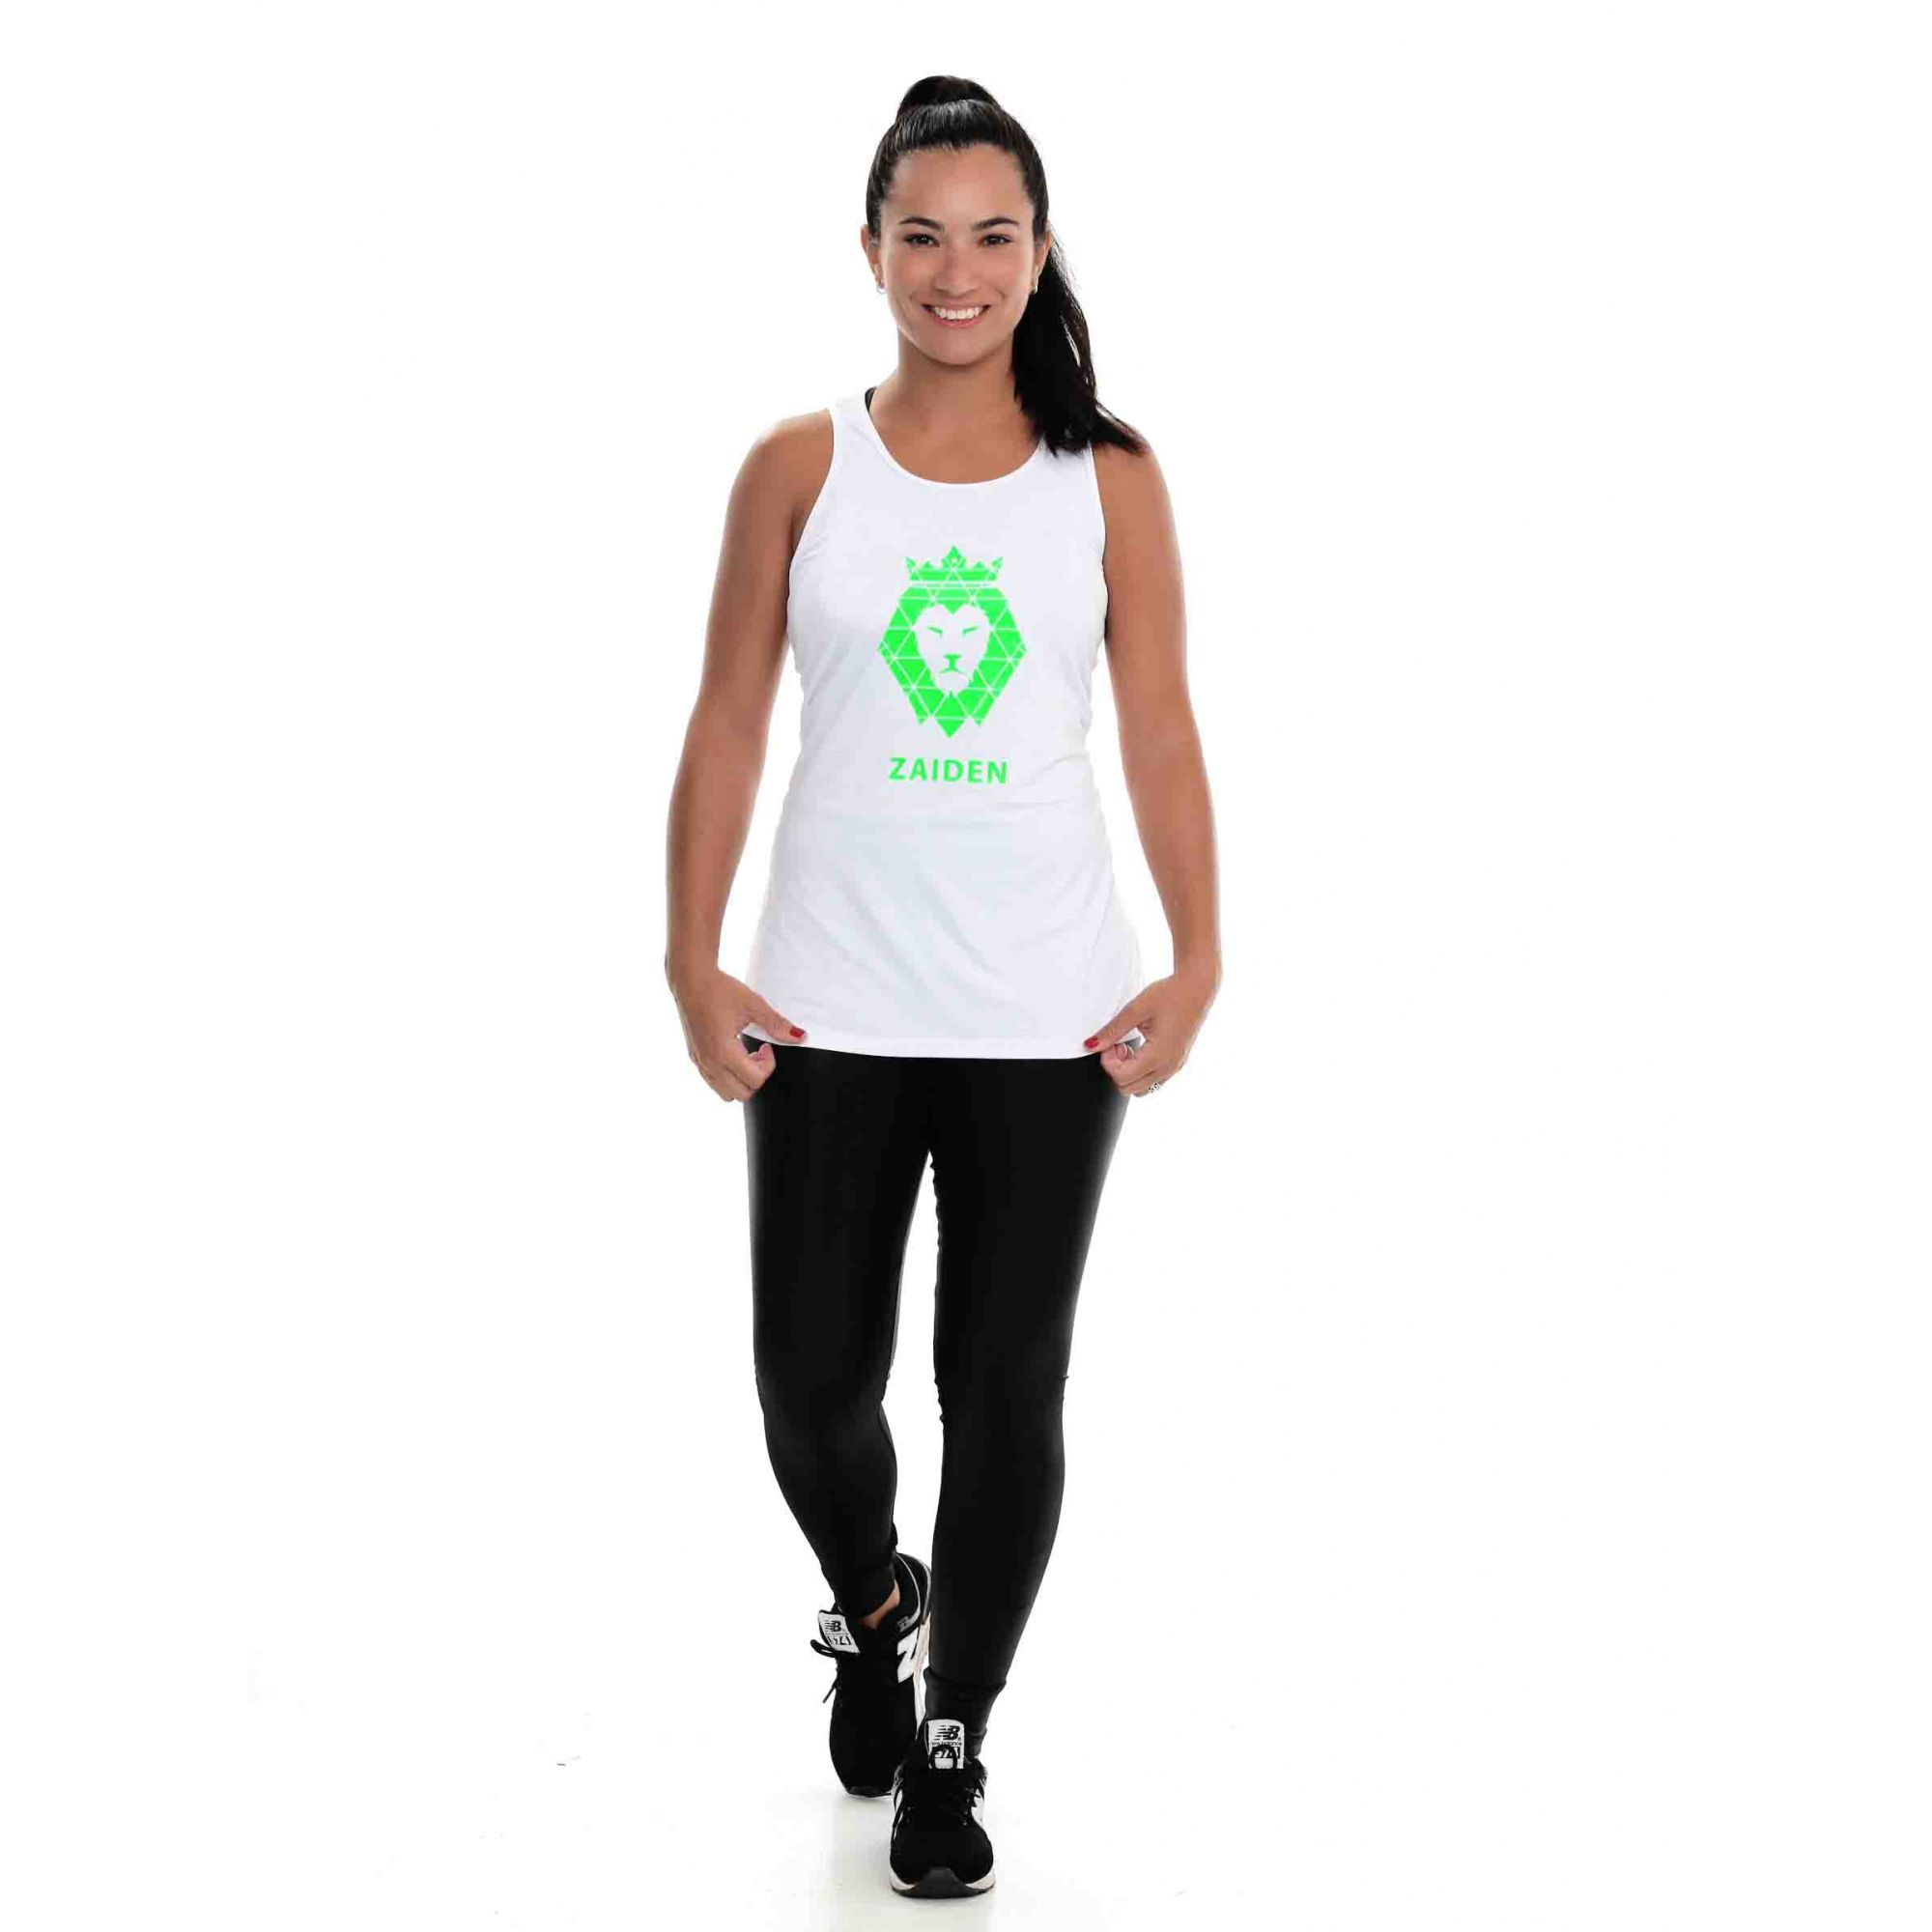 Regata Feminina Poliamida ZAIDEN Branca Leão Verde